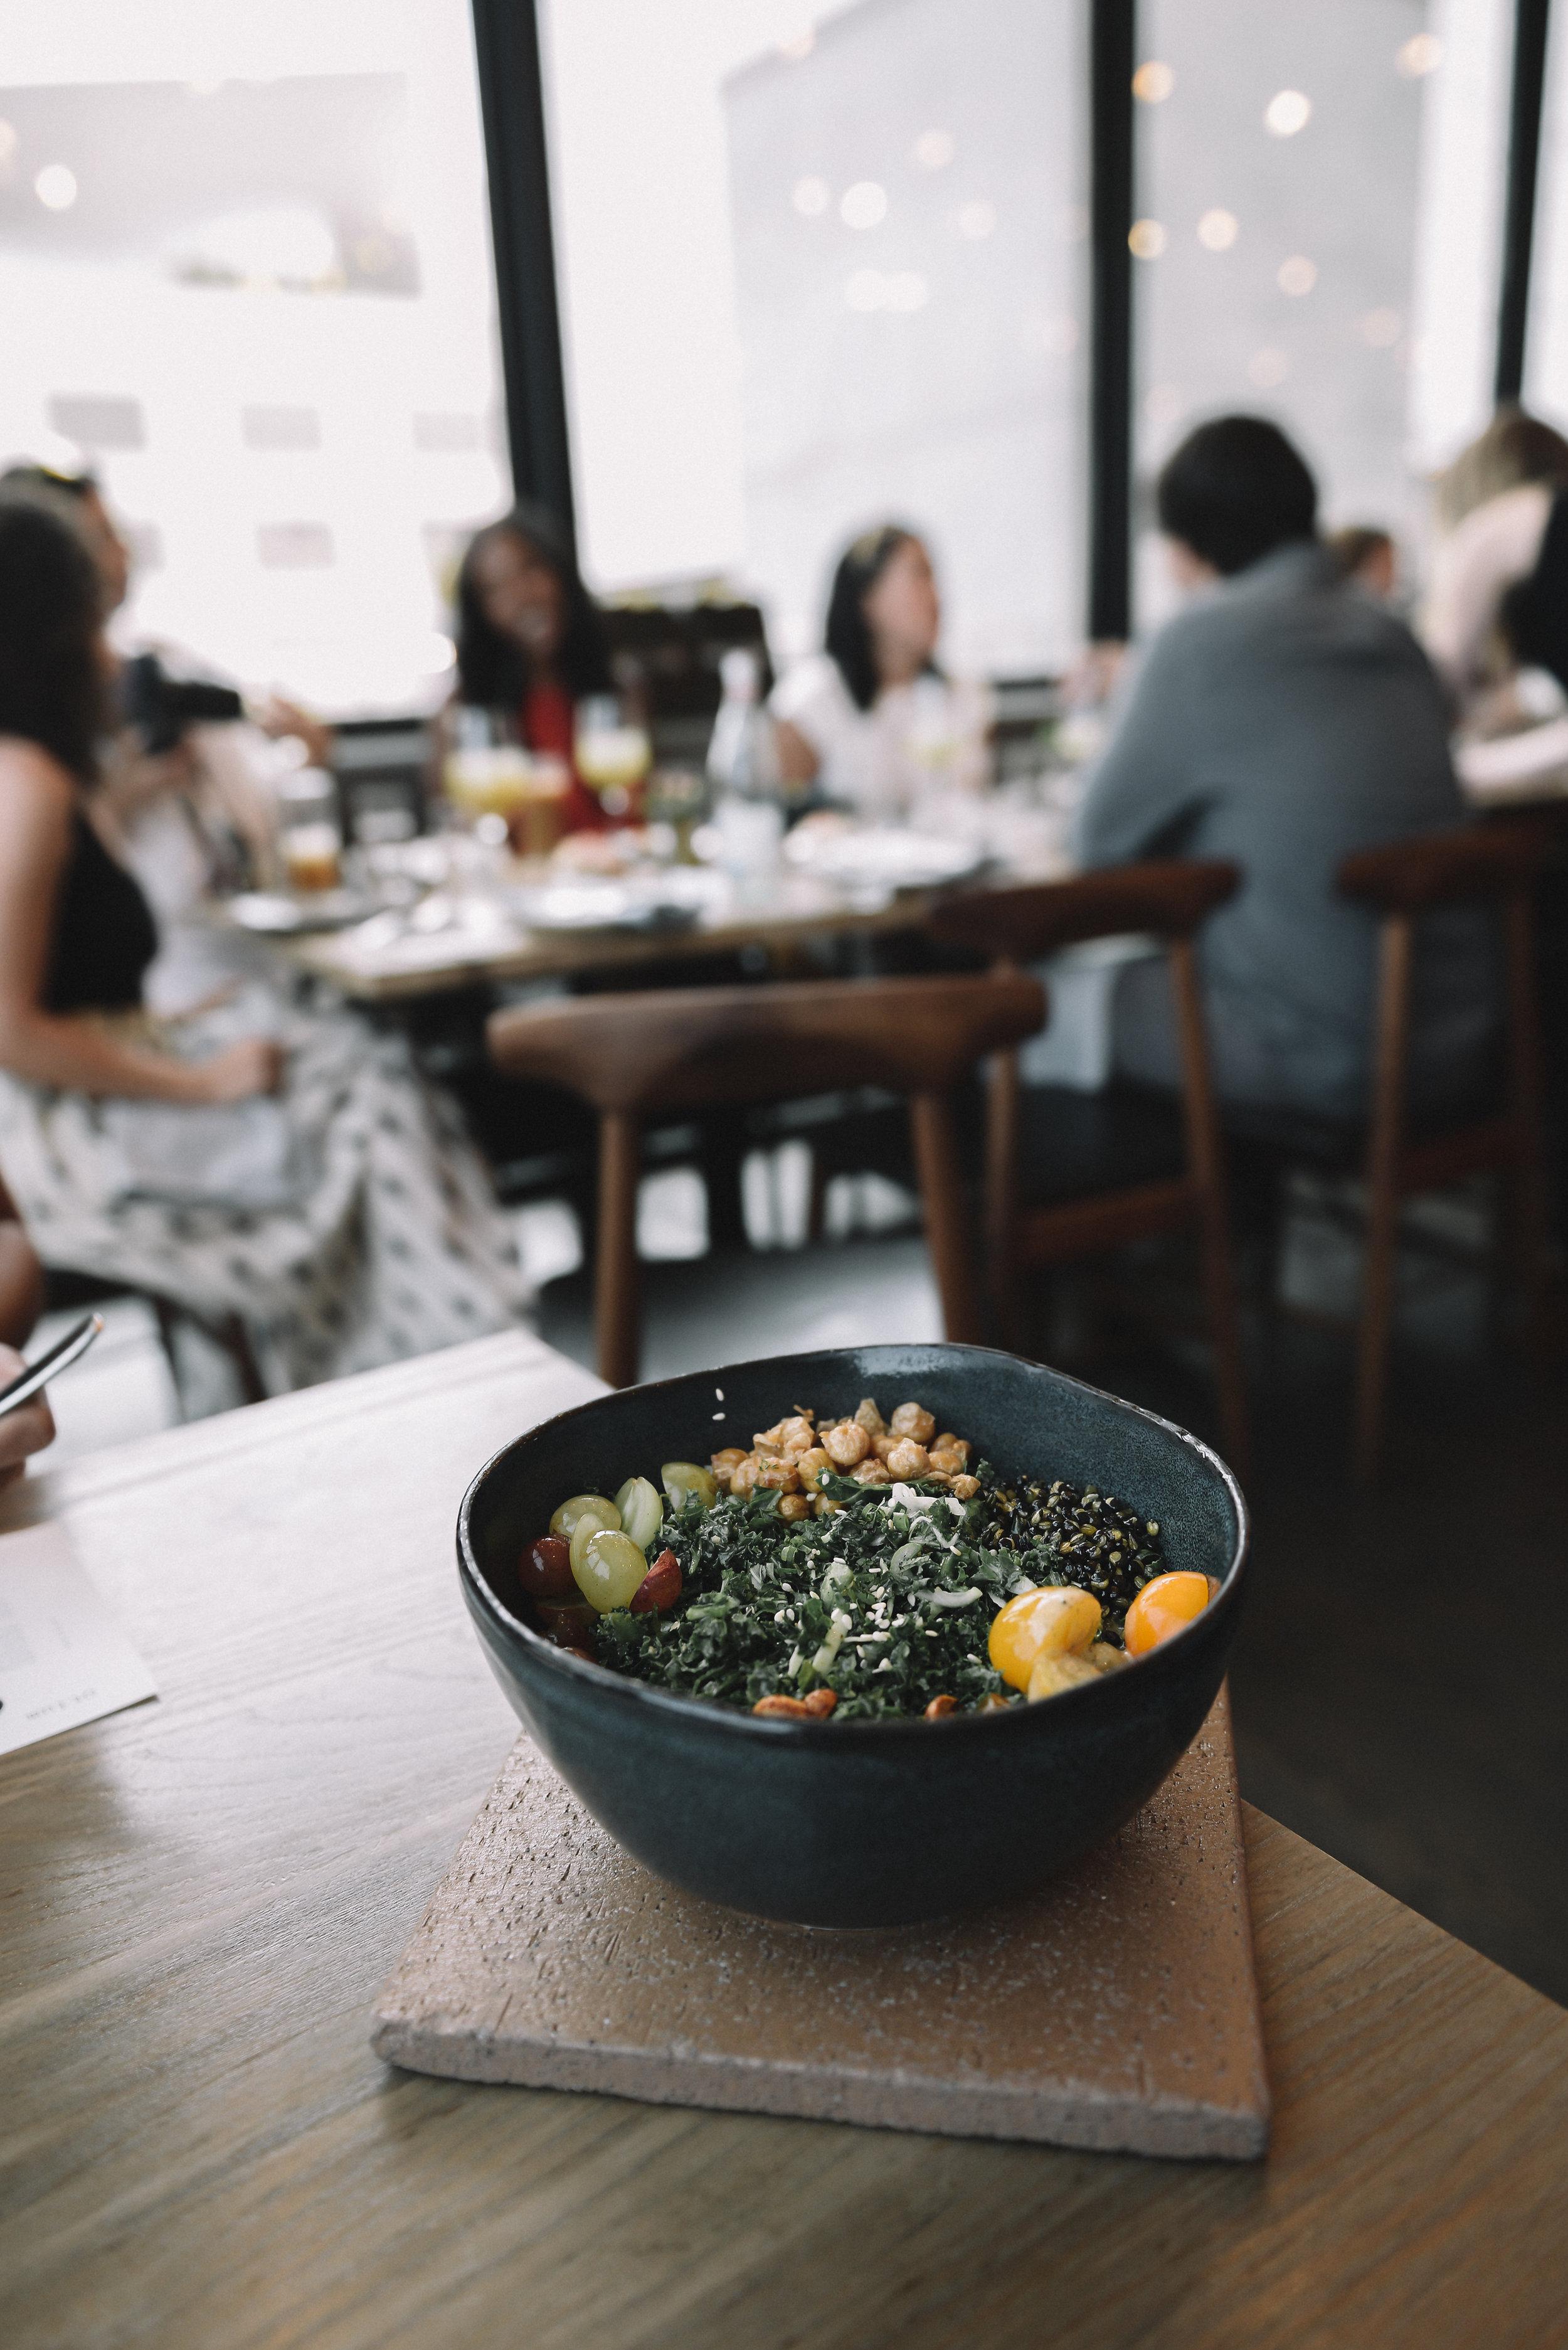 Kale • Cabbage • Lentils • Peanuts • Garbanzos • Grapes • Tomatoes